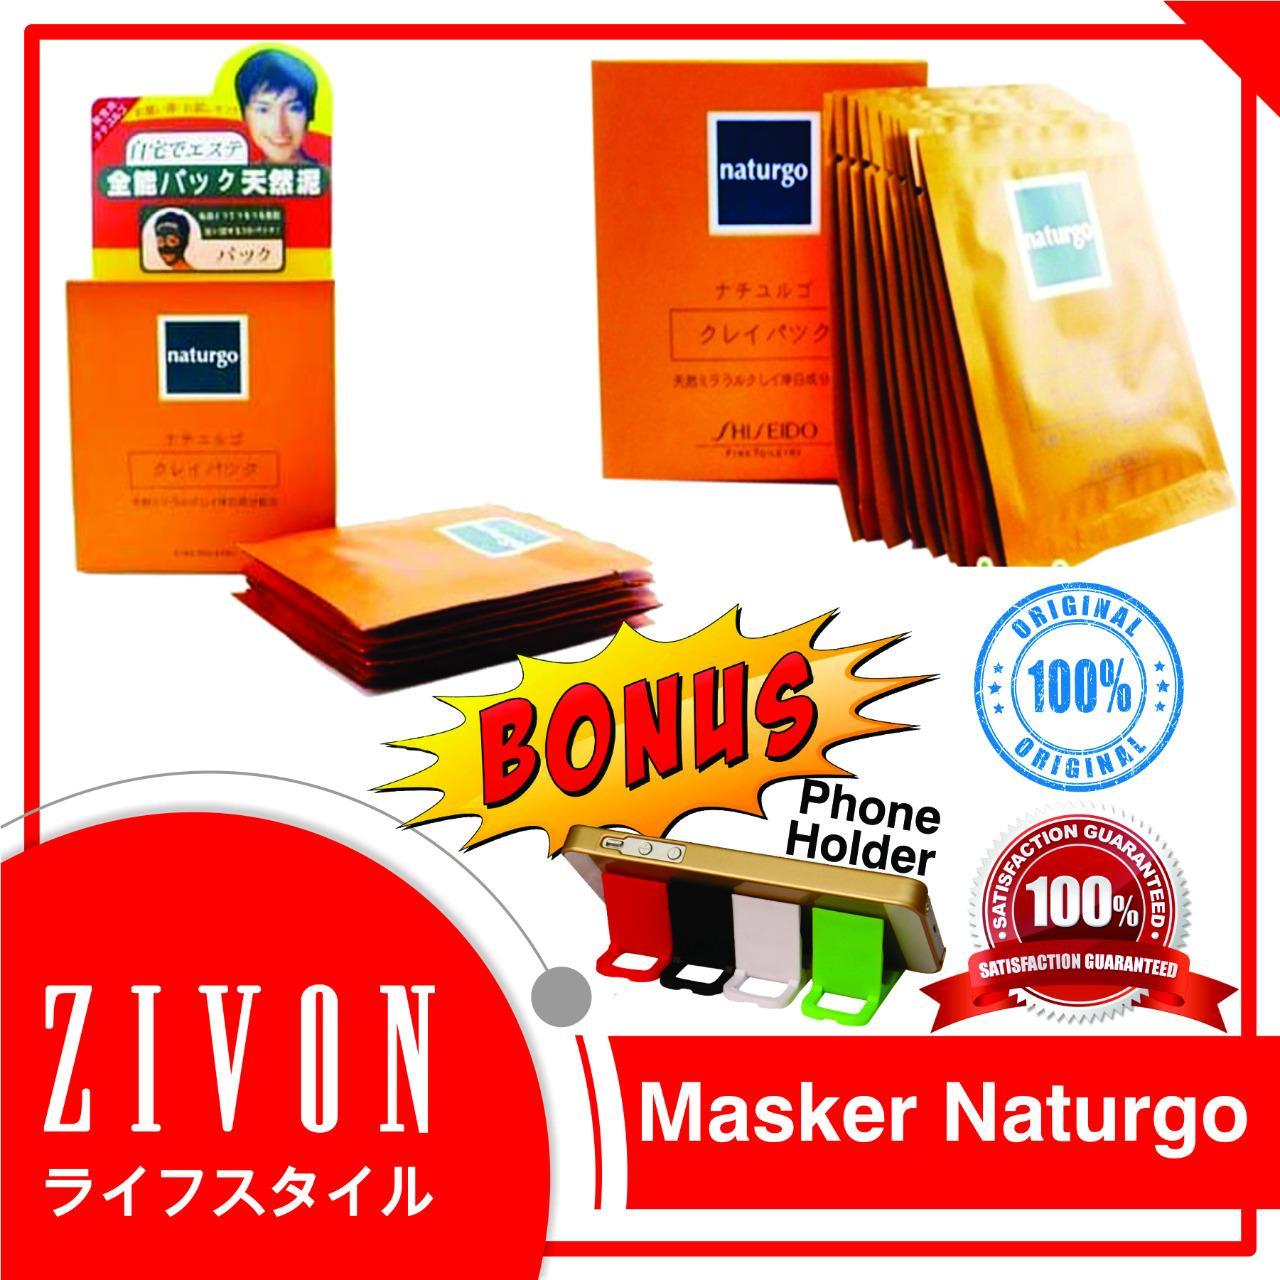 Masker Lumpur Naturgo Emas Shiseido Gold Mas 24k 10pcs Daftar Wajah Muka Beli 1 Gratis 4